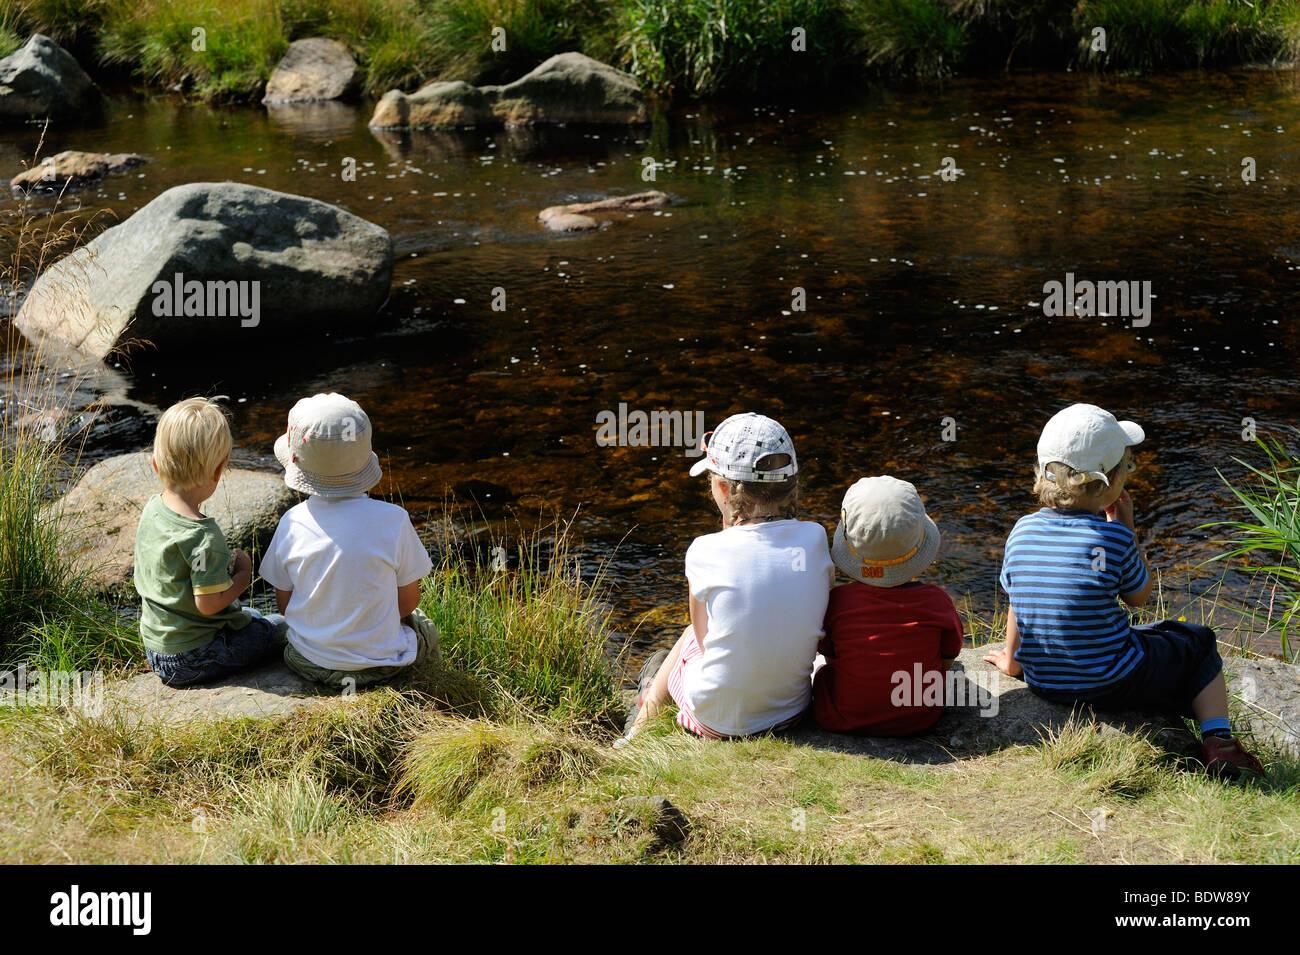 Children sitting on bank of river, Modrava Roklansky potok Sumava National Park Czech Republic - Stock Image